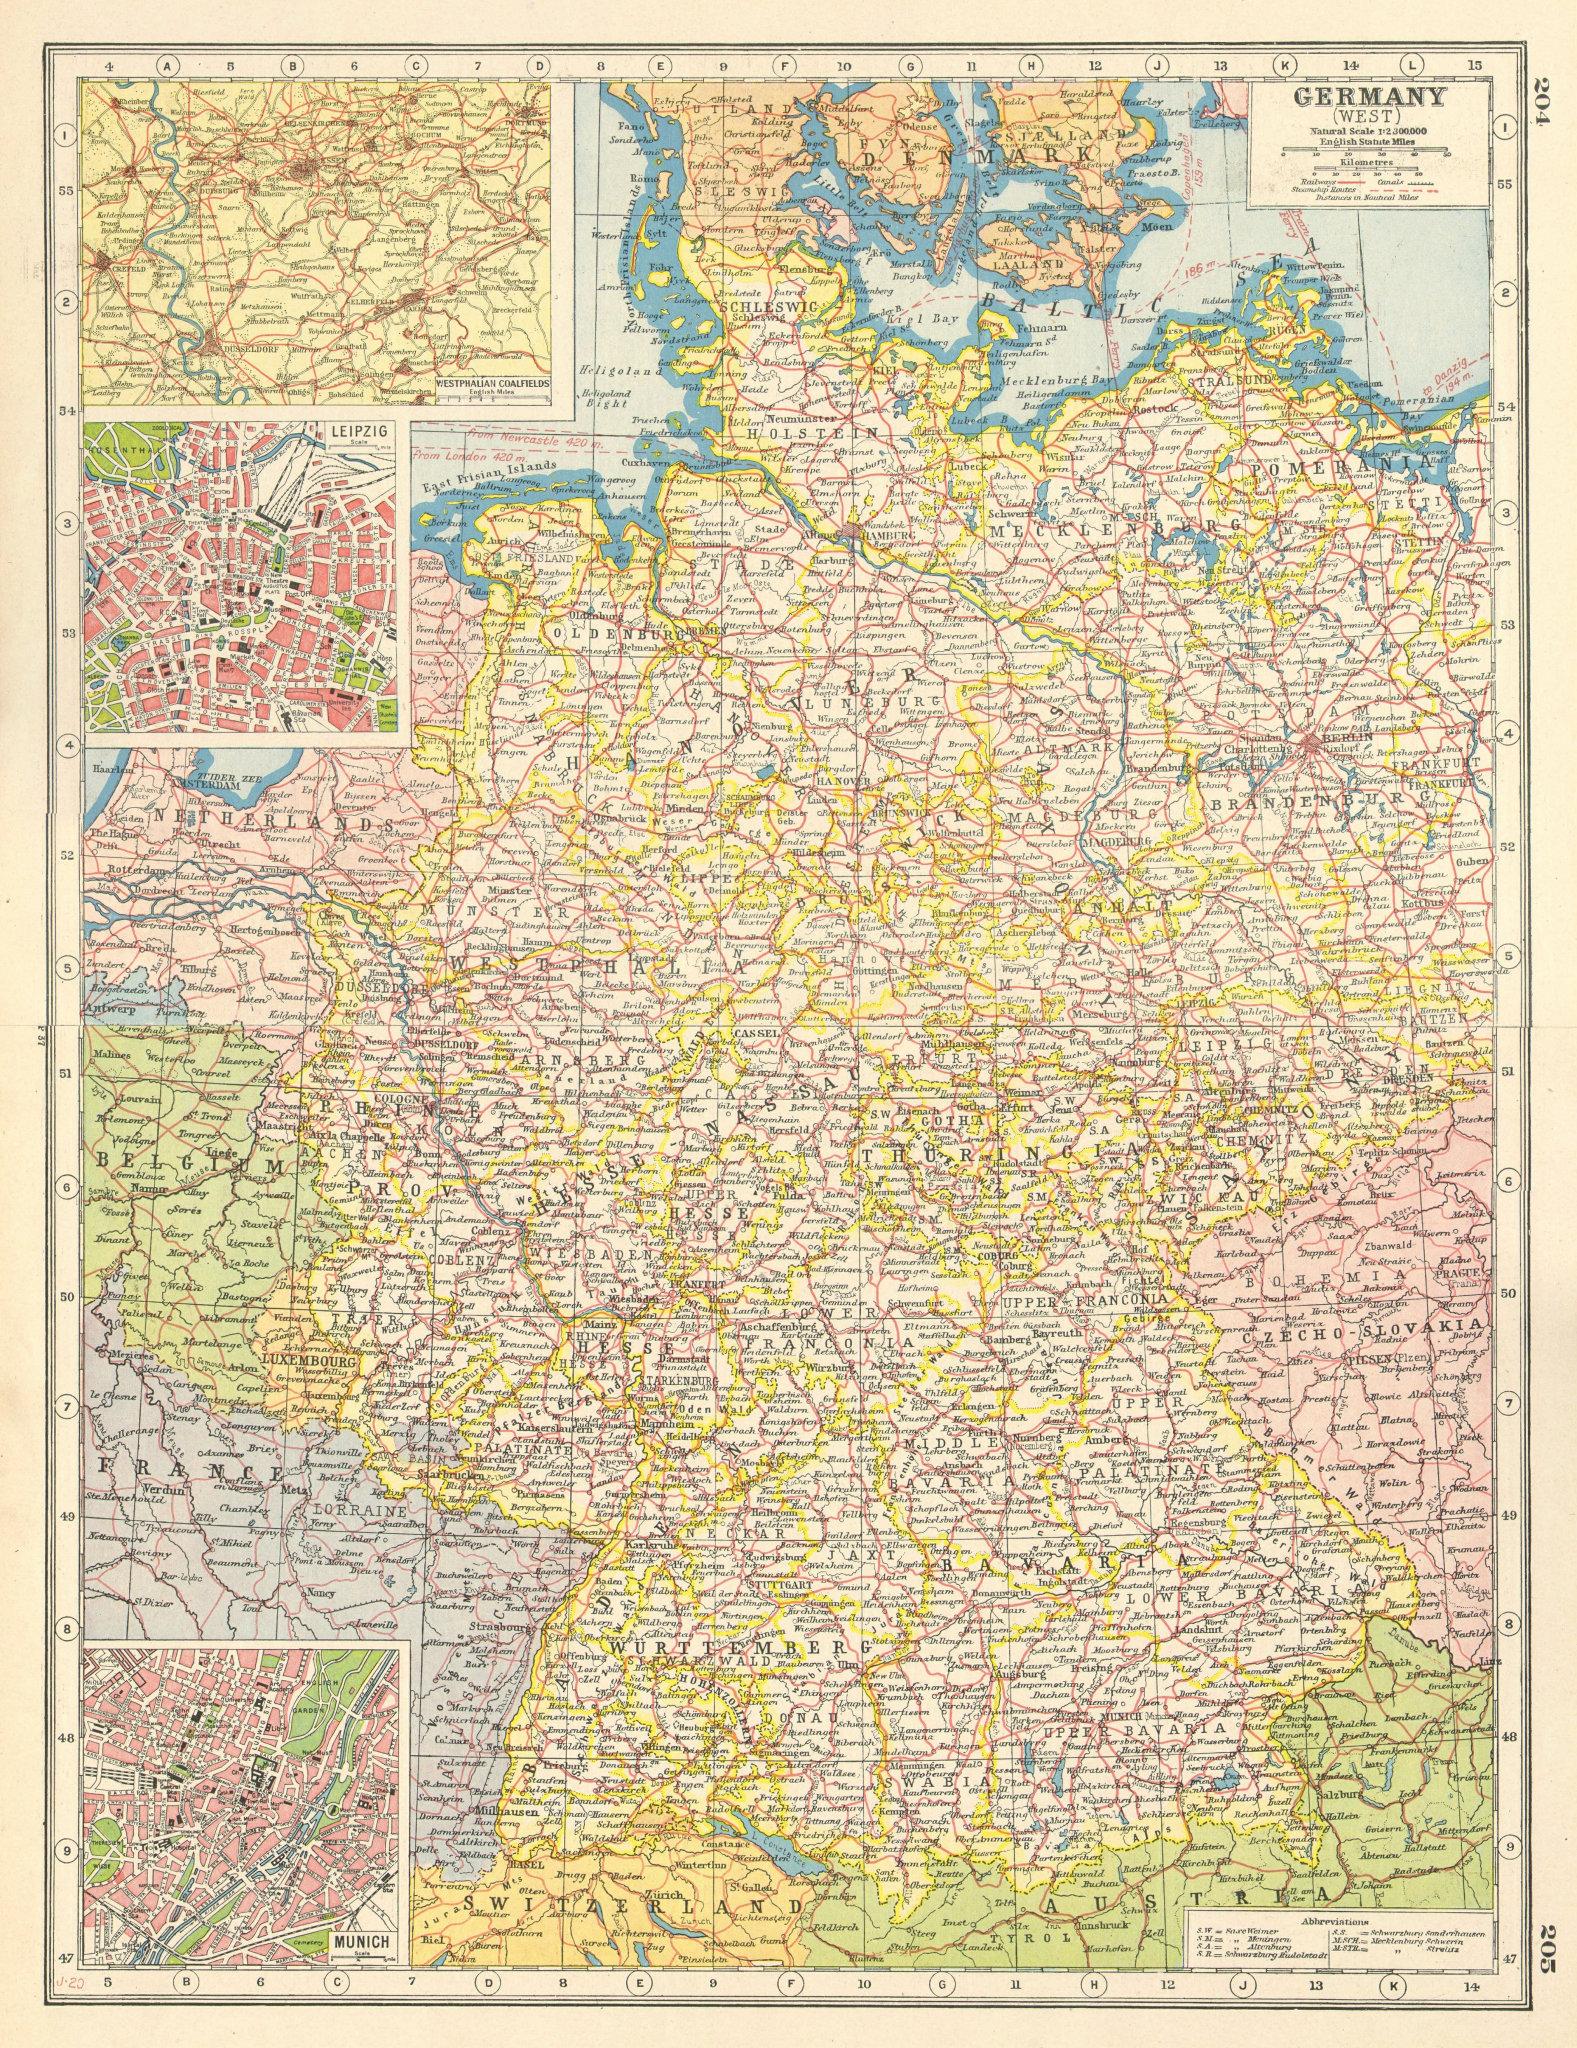 Associate Product WESTERN GERMANY.inset Westphalian Ruhr Coalfields Leipzig Munich plans 1920 map